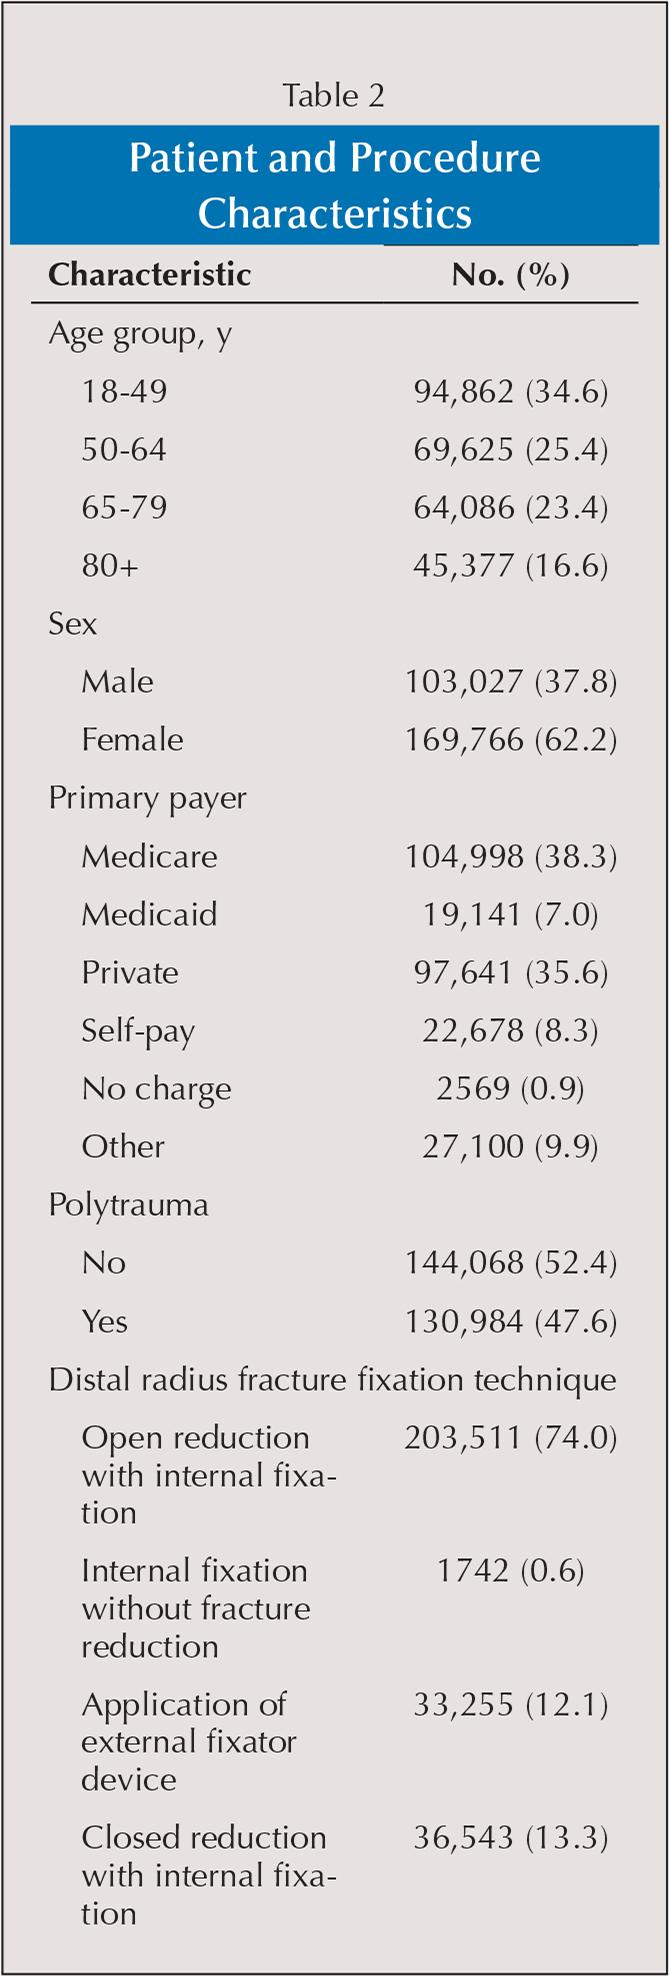 Patient and Procedure Characteristics